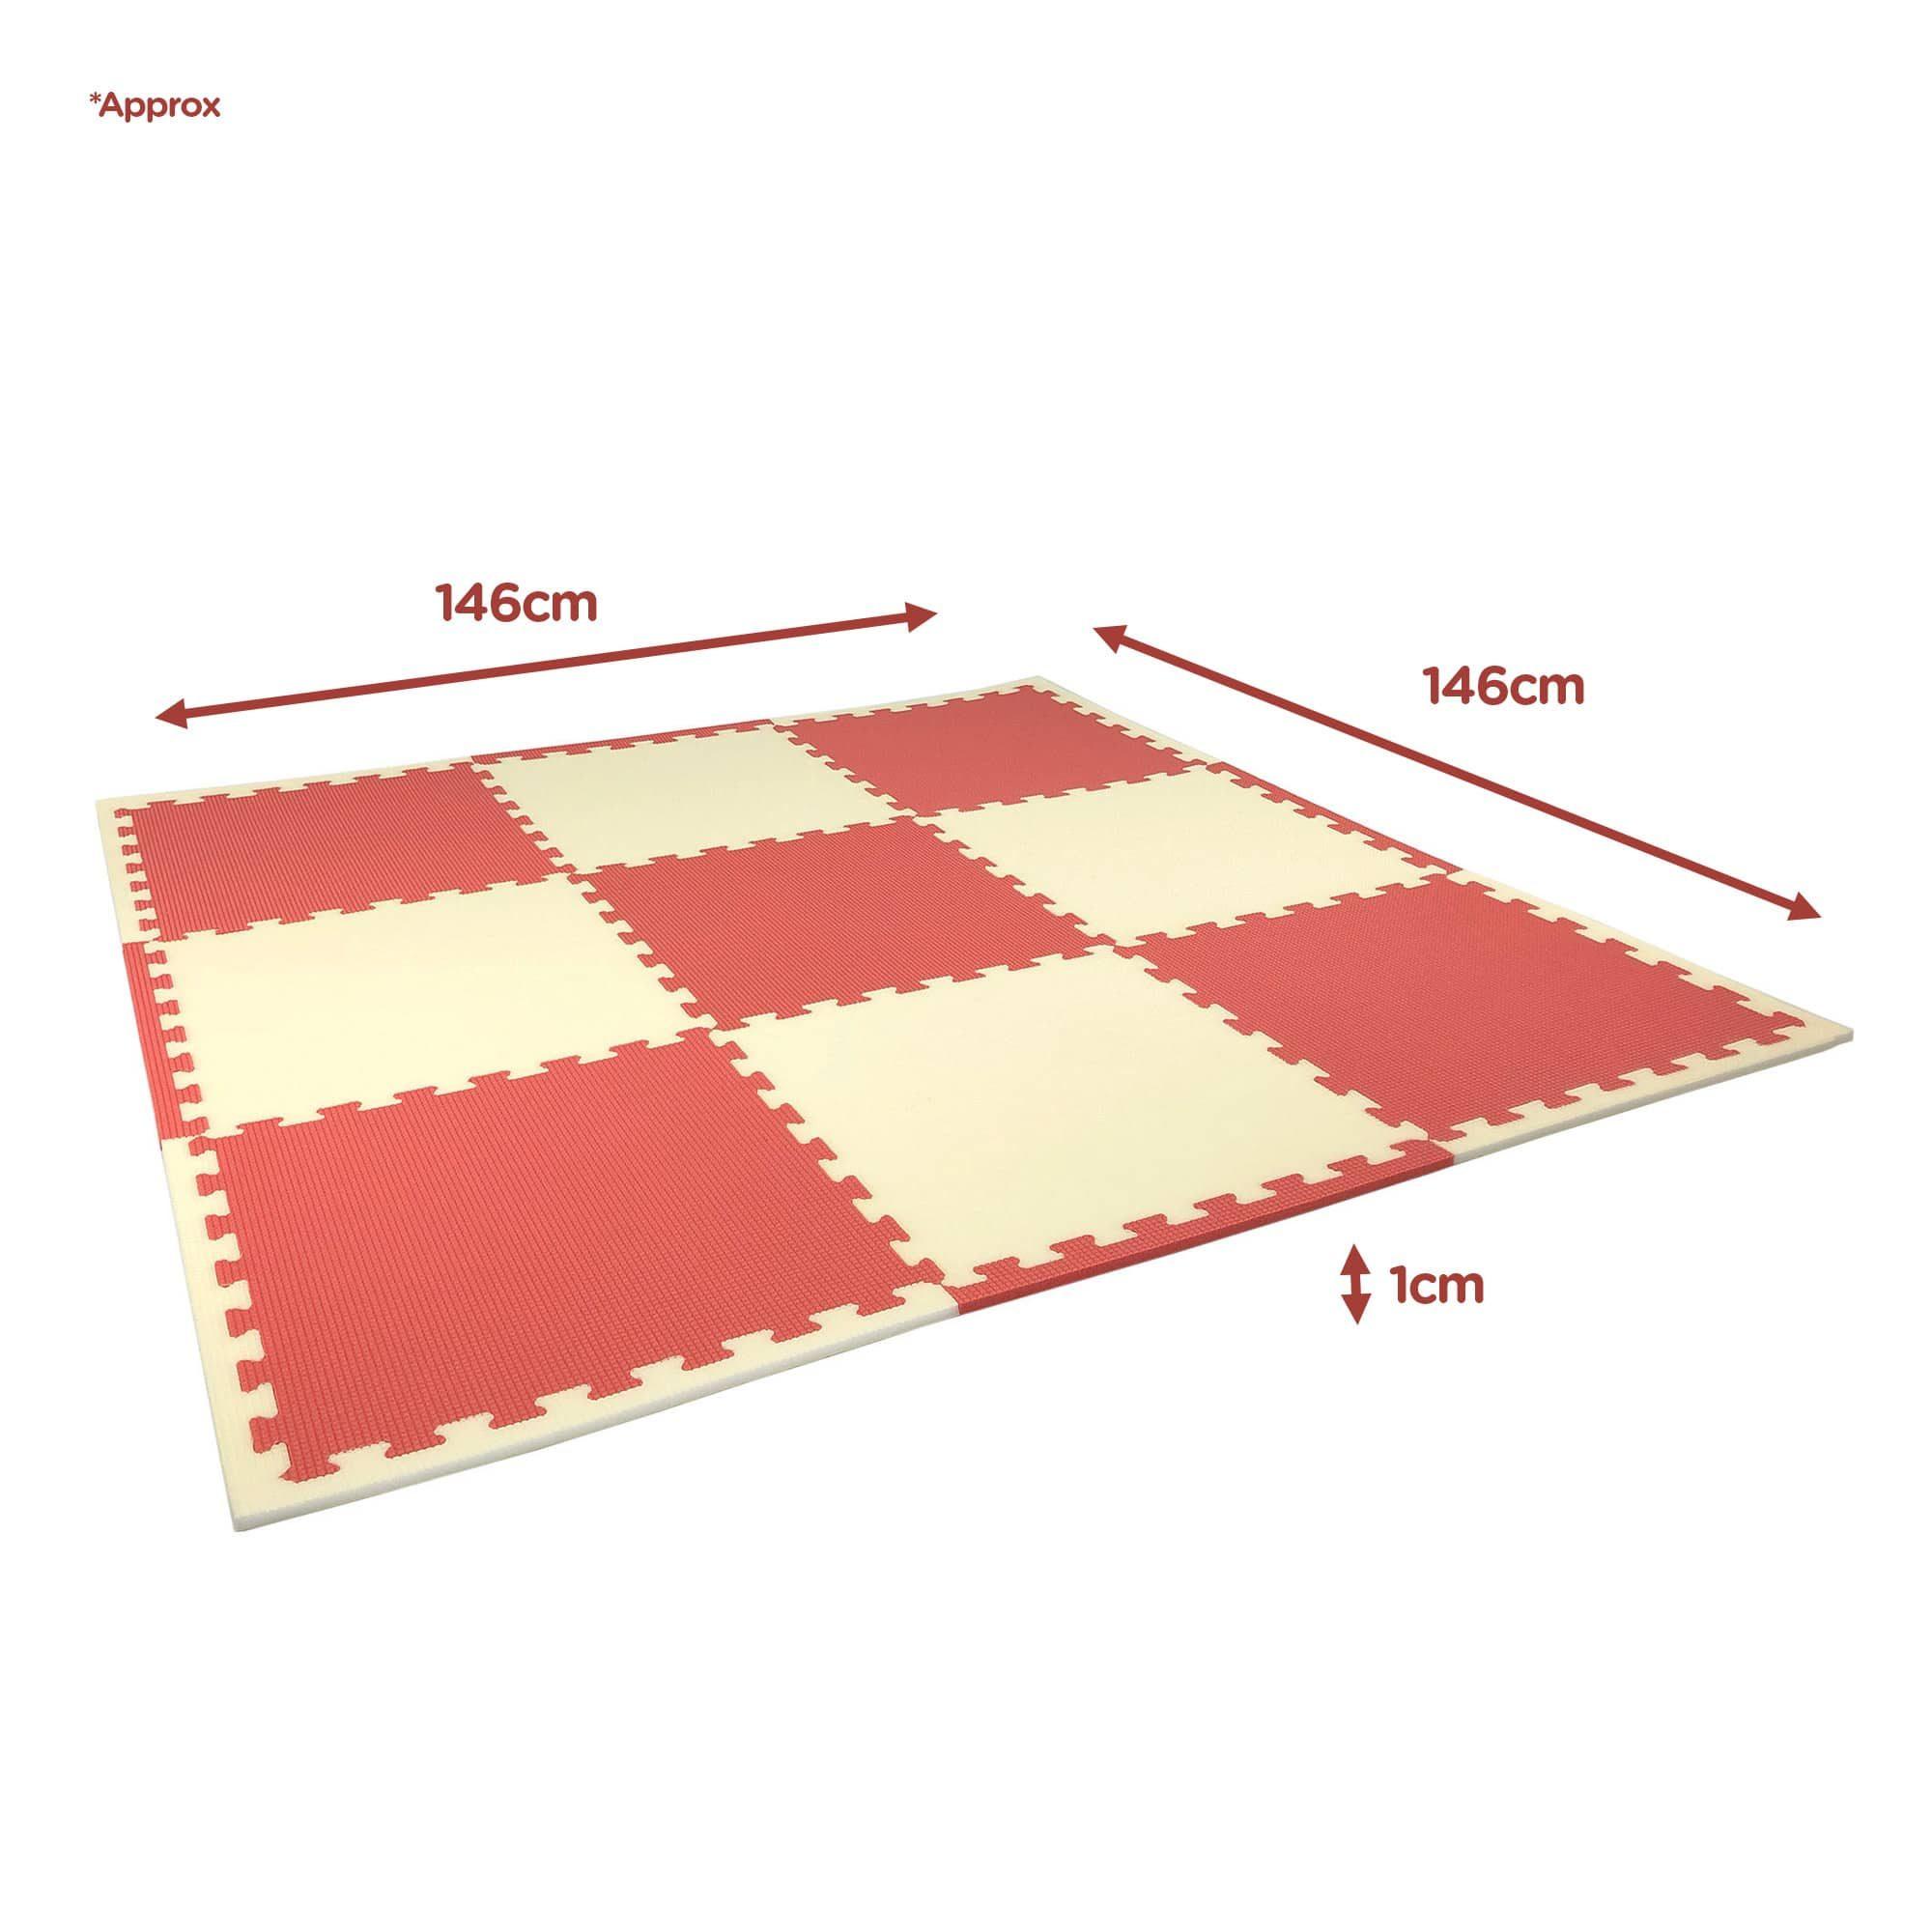 Coral reef foam playmats dimensions